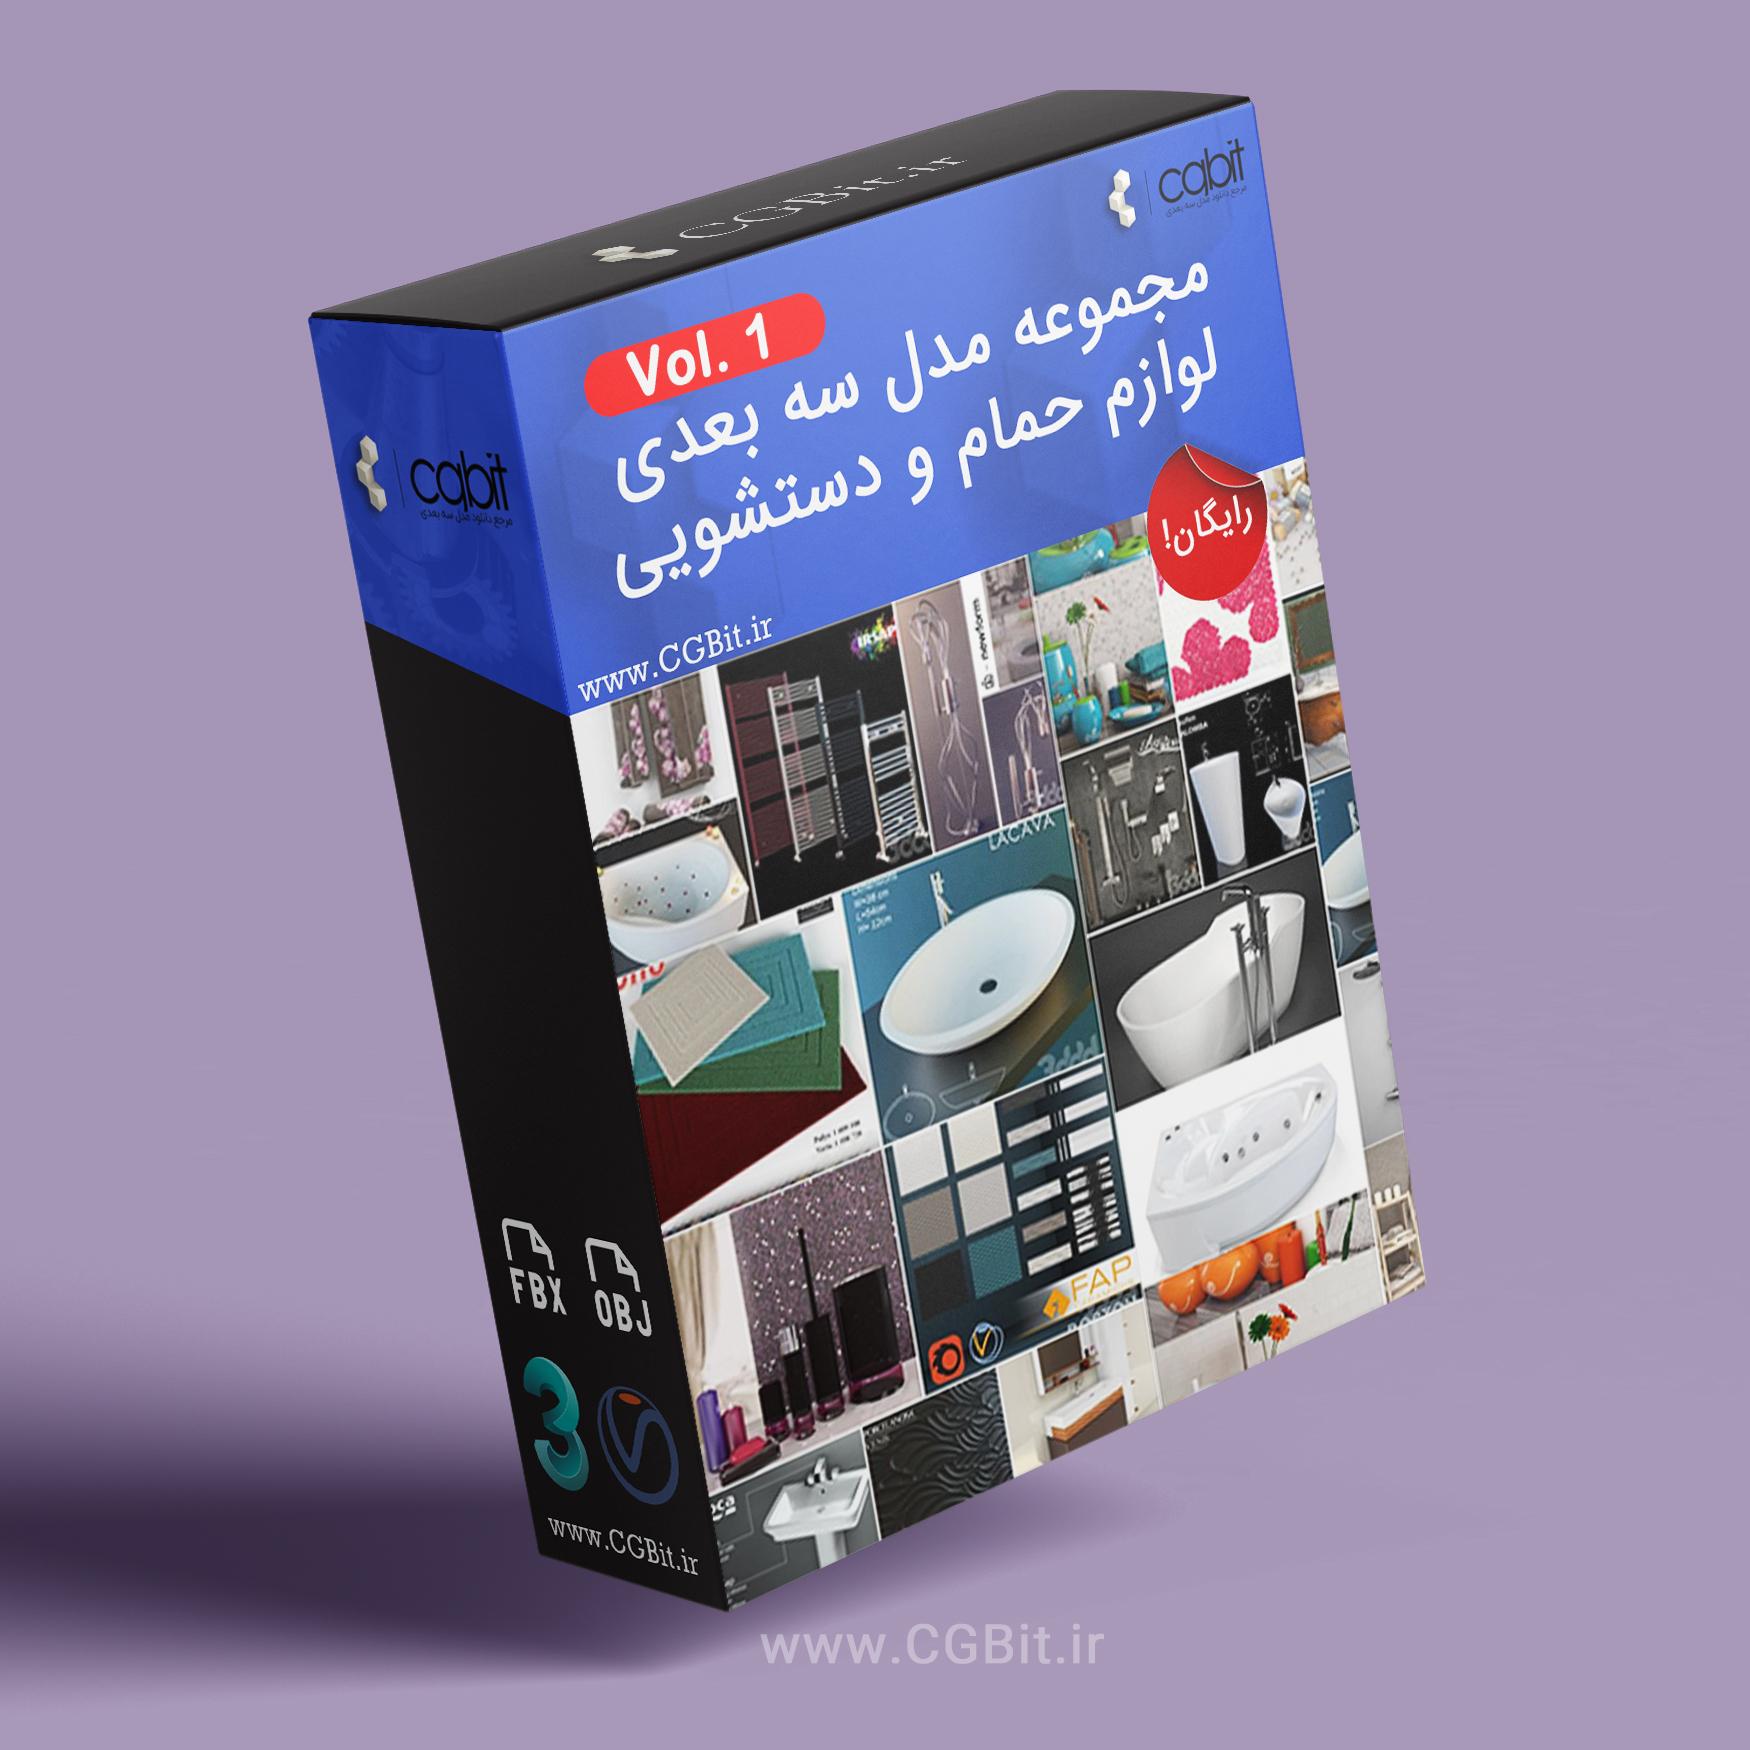 anx0 bathroom collection vol1 - مجموعه مدل سه بعدی لوازم حمام و دستشویی Vol. 1